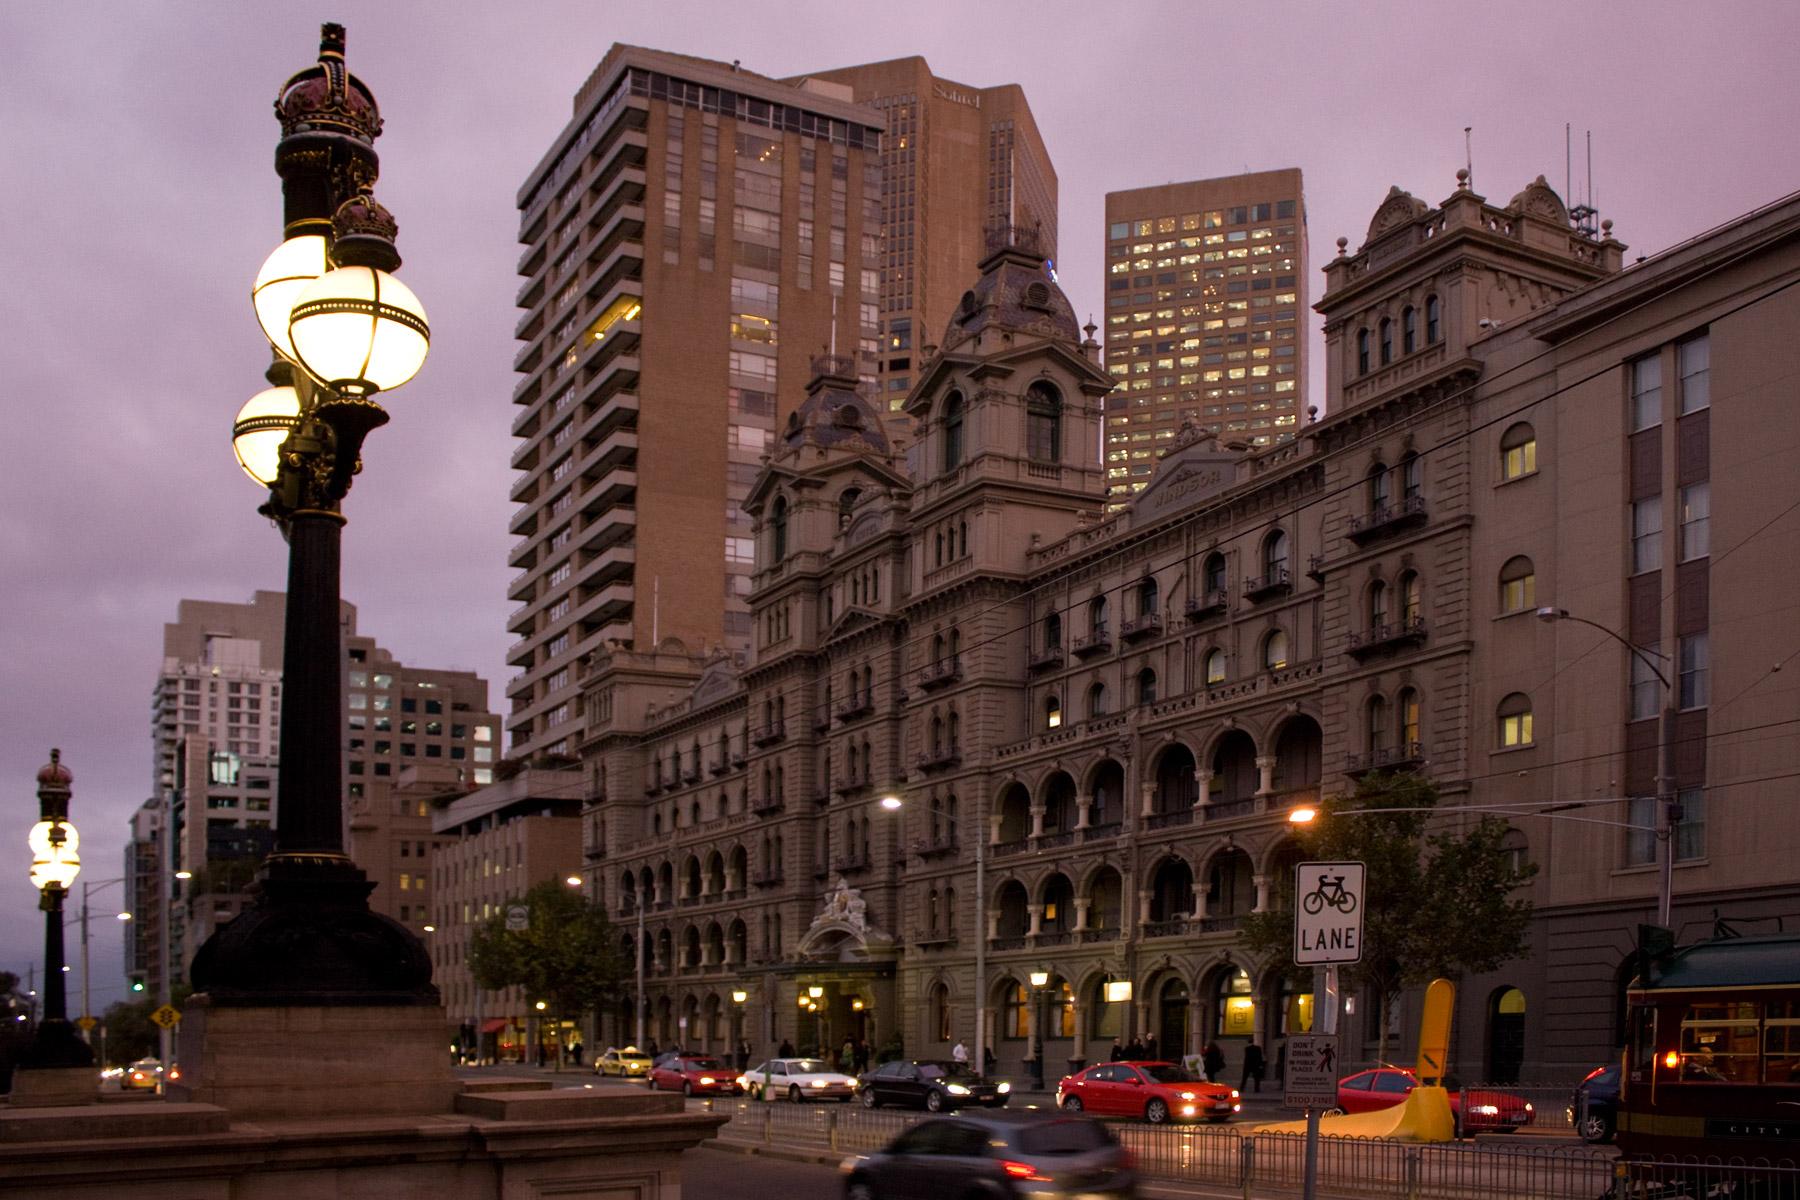 Windsor Hotel in Melbourne